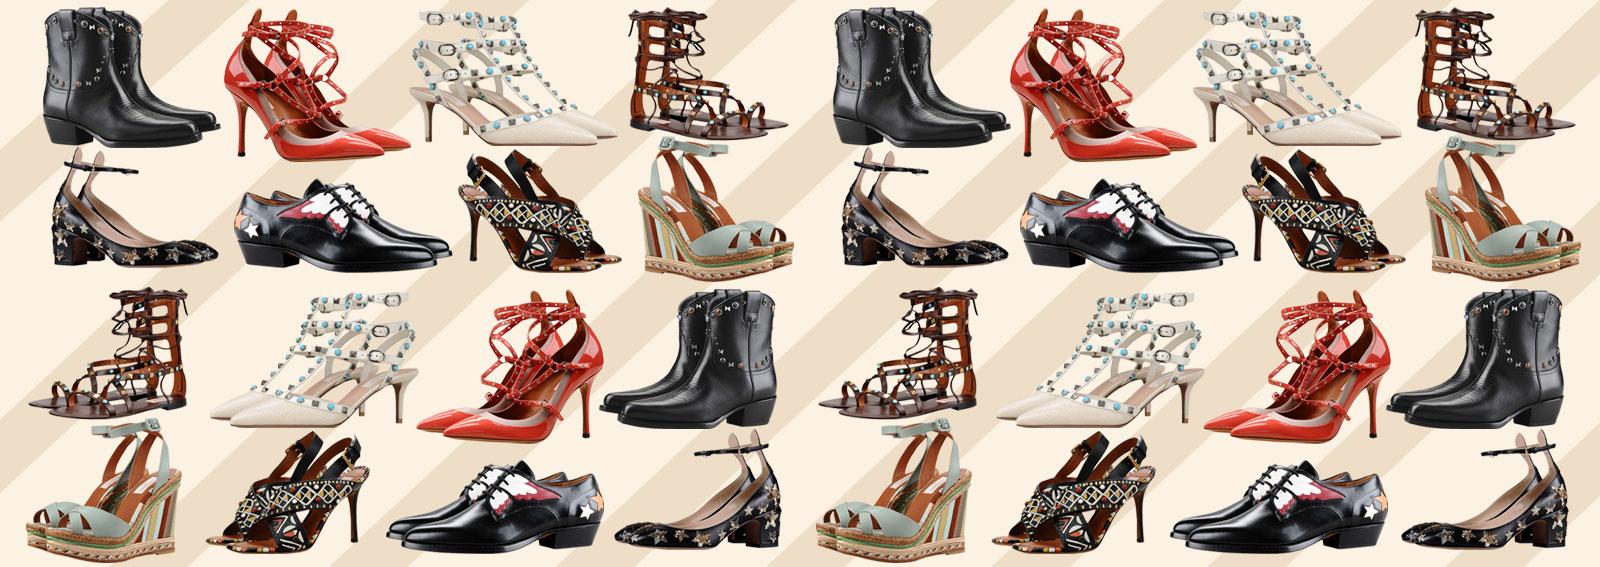 cover scarpe valentino estate 2016 desktop